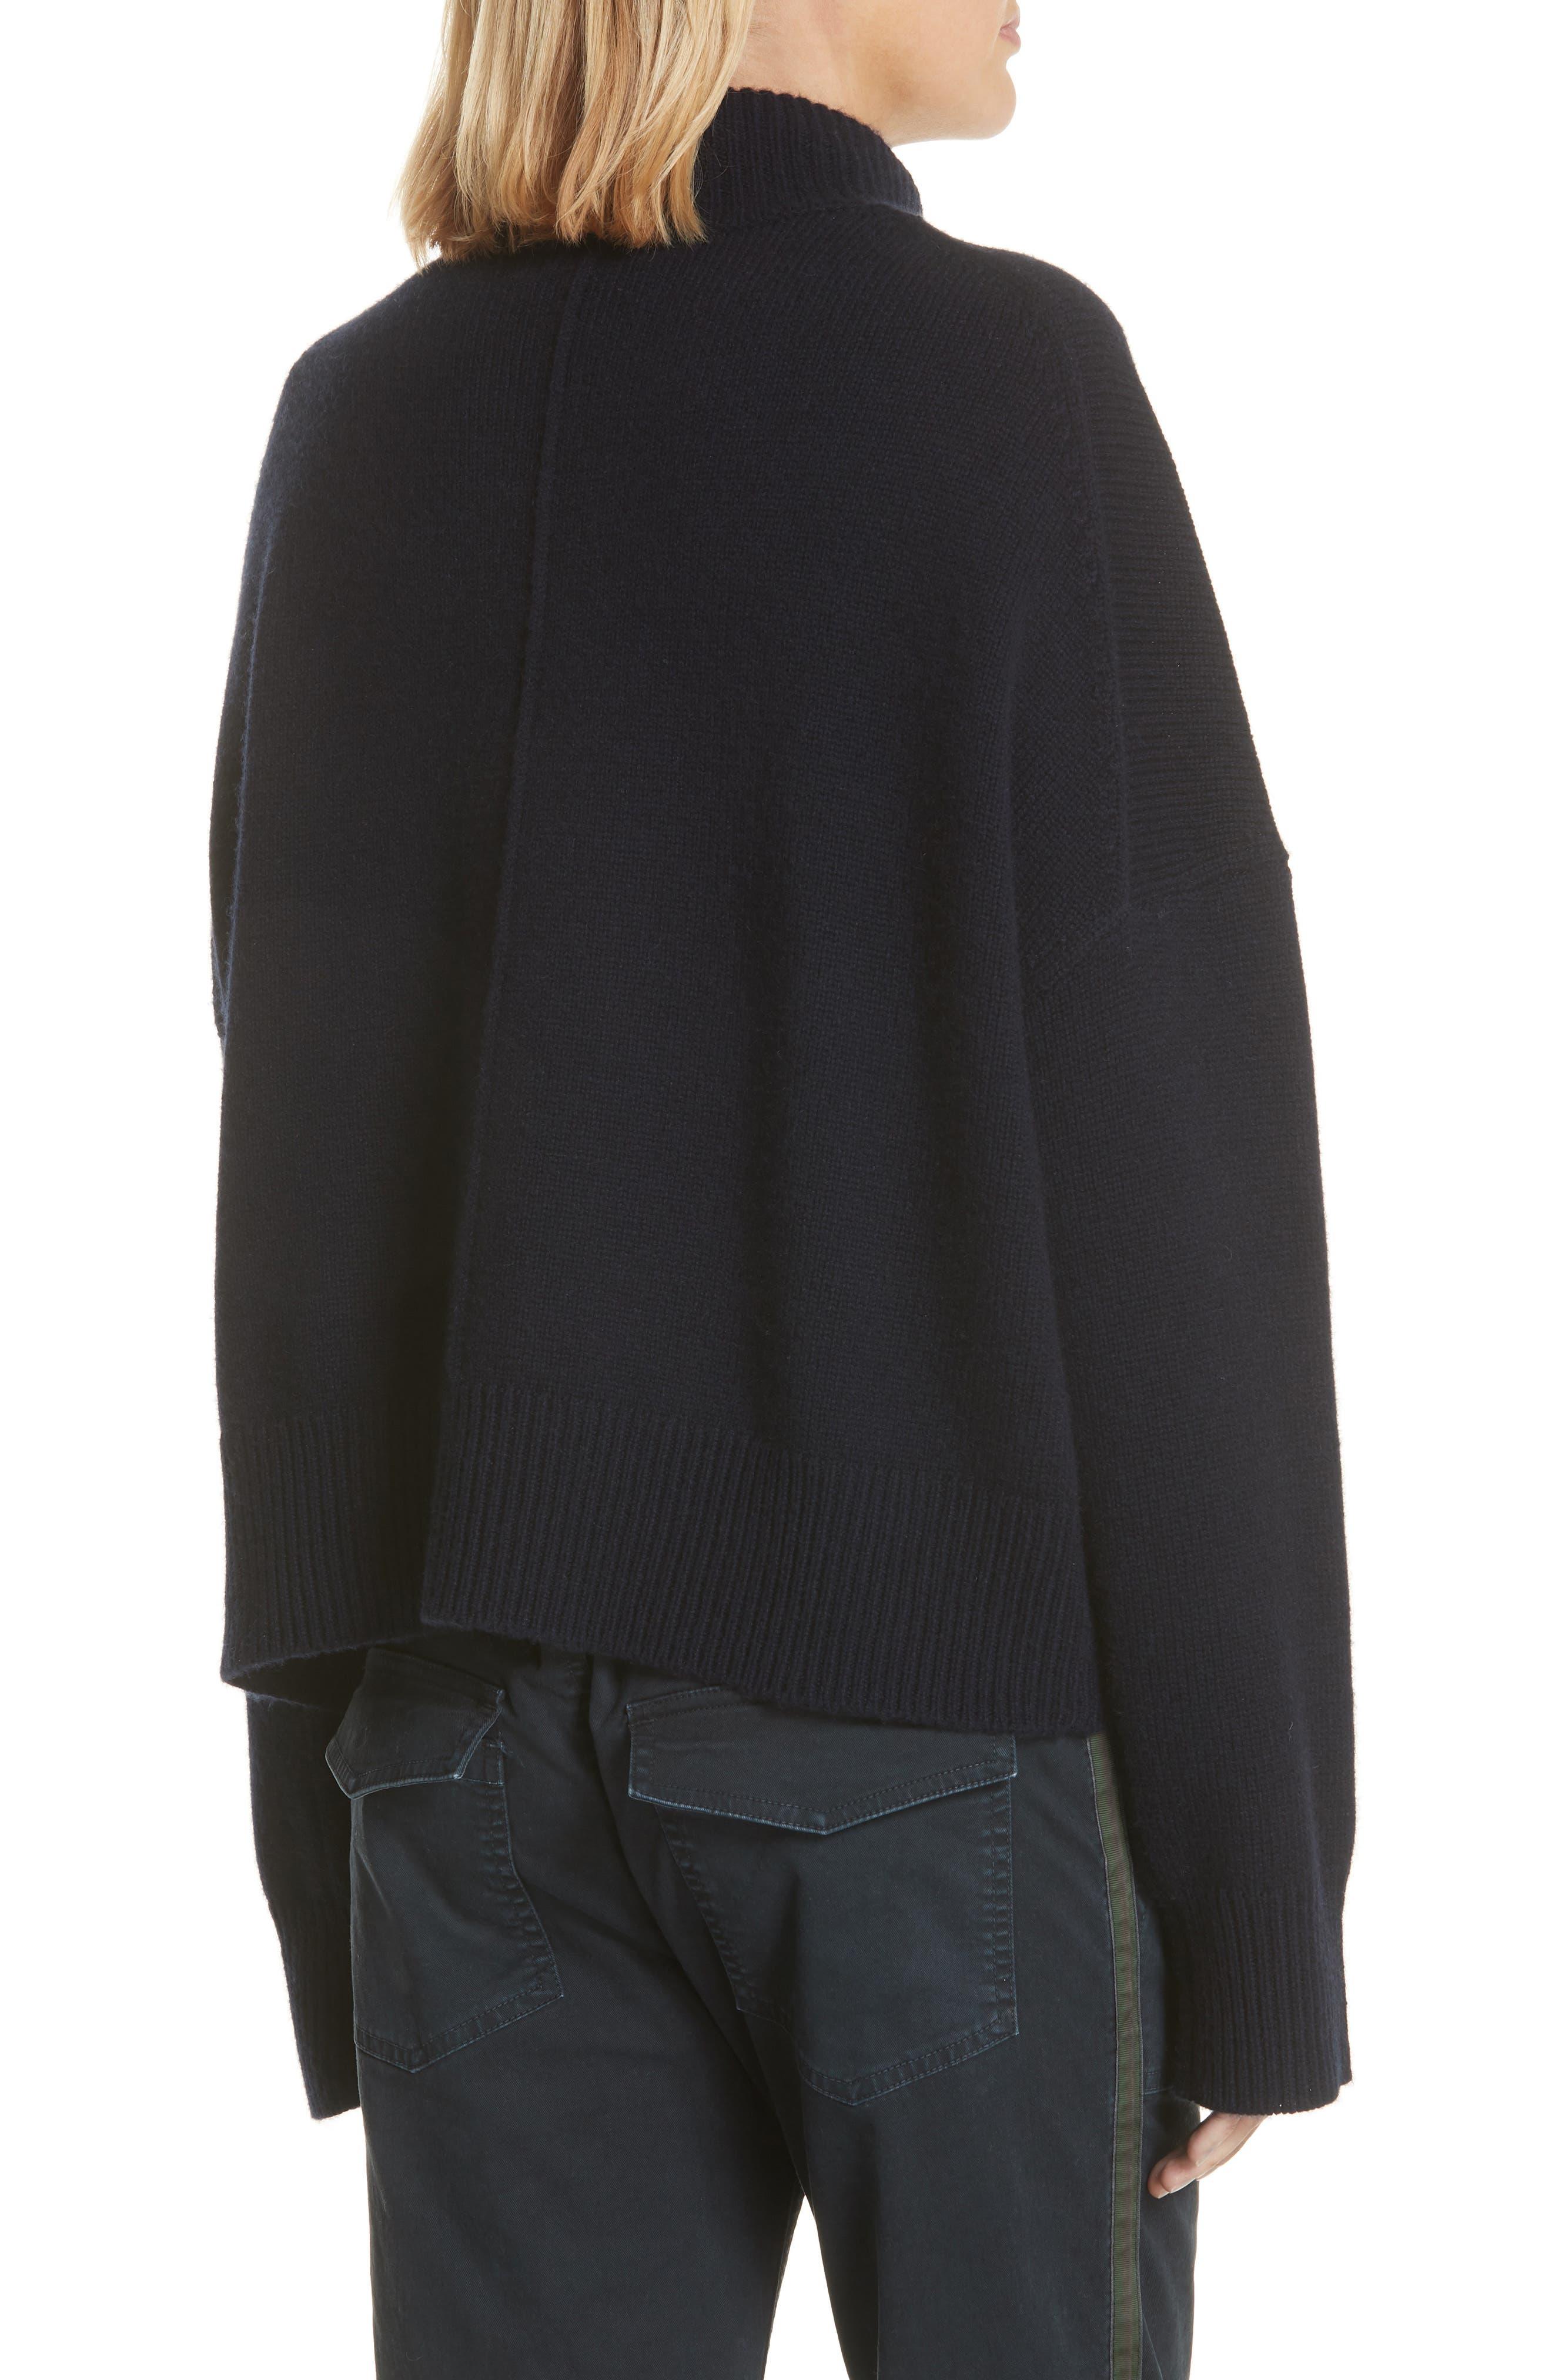 Serinda Wool & Cashmere Turtleneck Sweater,                             Alternate thumbnail 2, color,                             Dark Navy